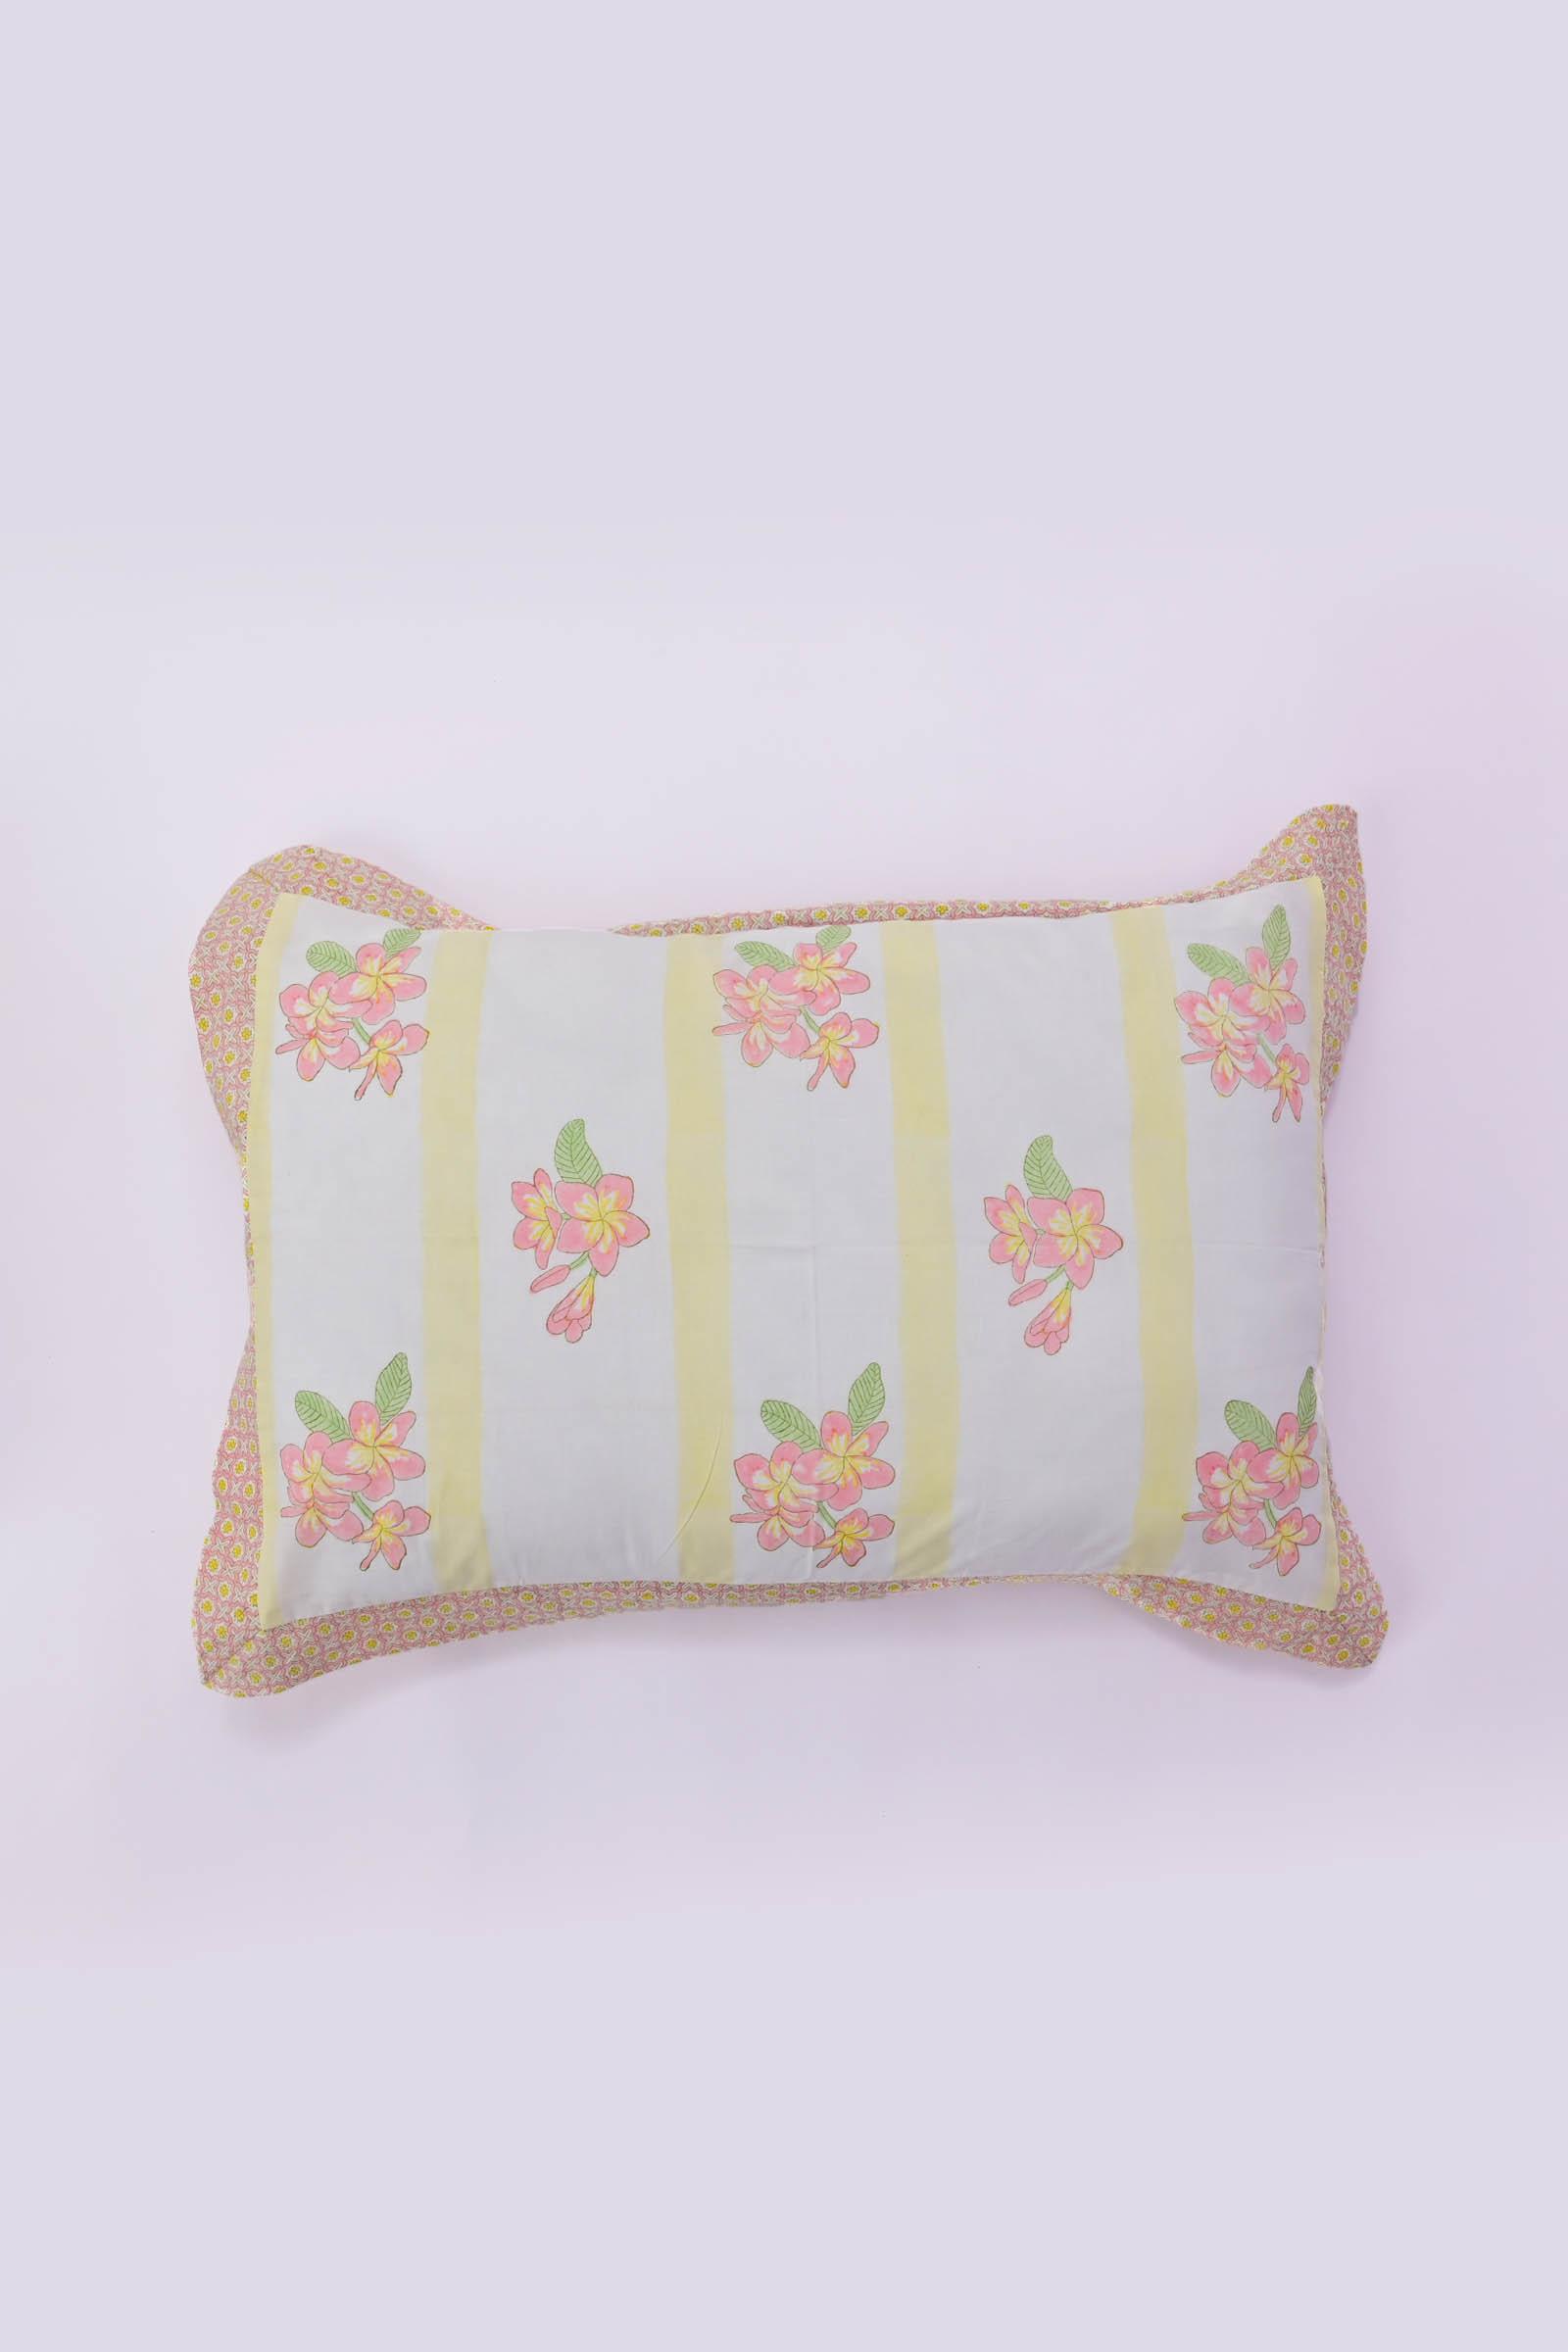 Frangipani Pillow Cover Set Of 2